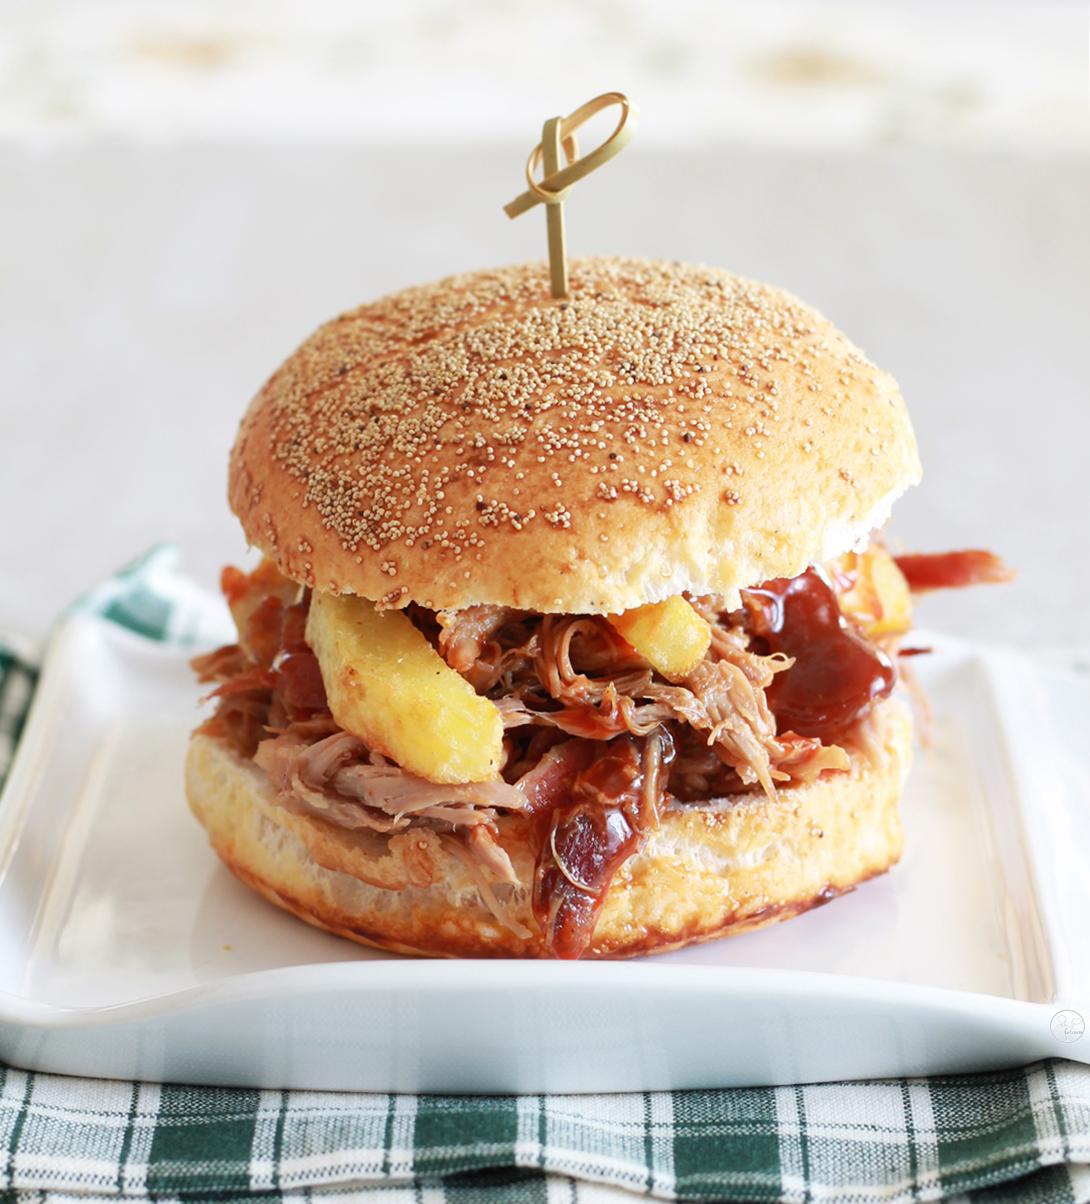 Pulled pork burger senza glutine - La Cassata Celiaca